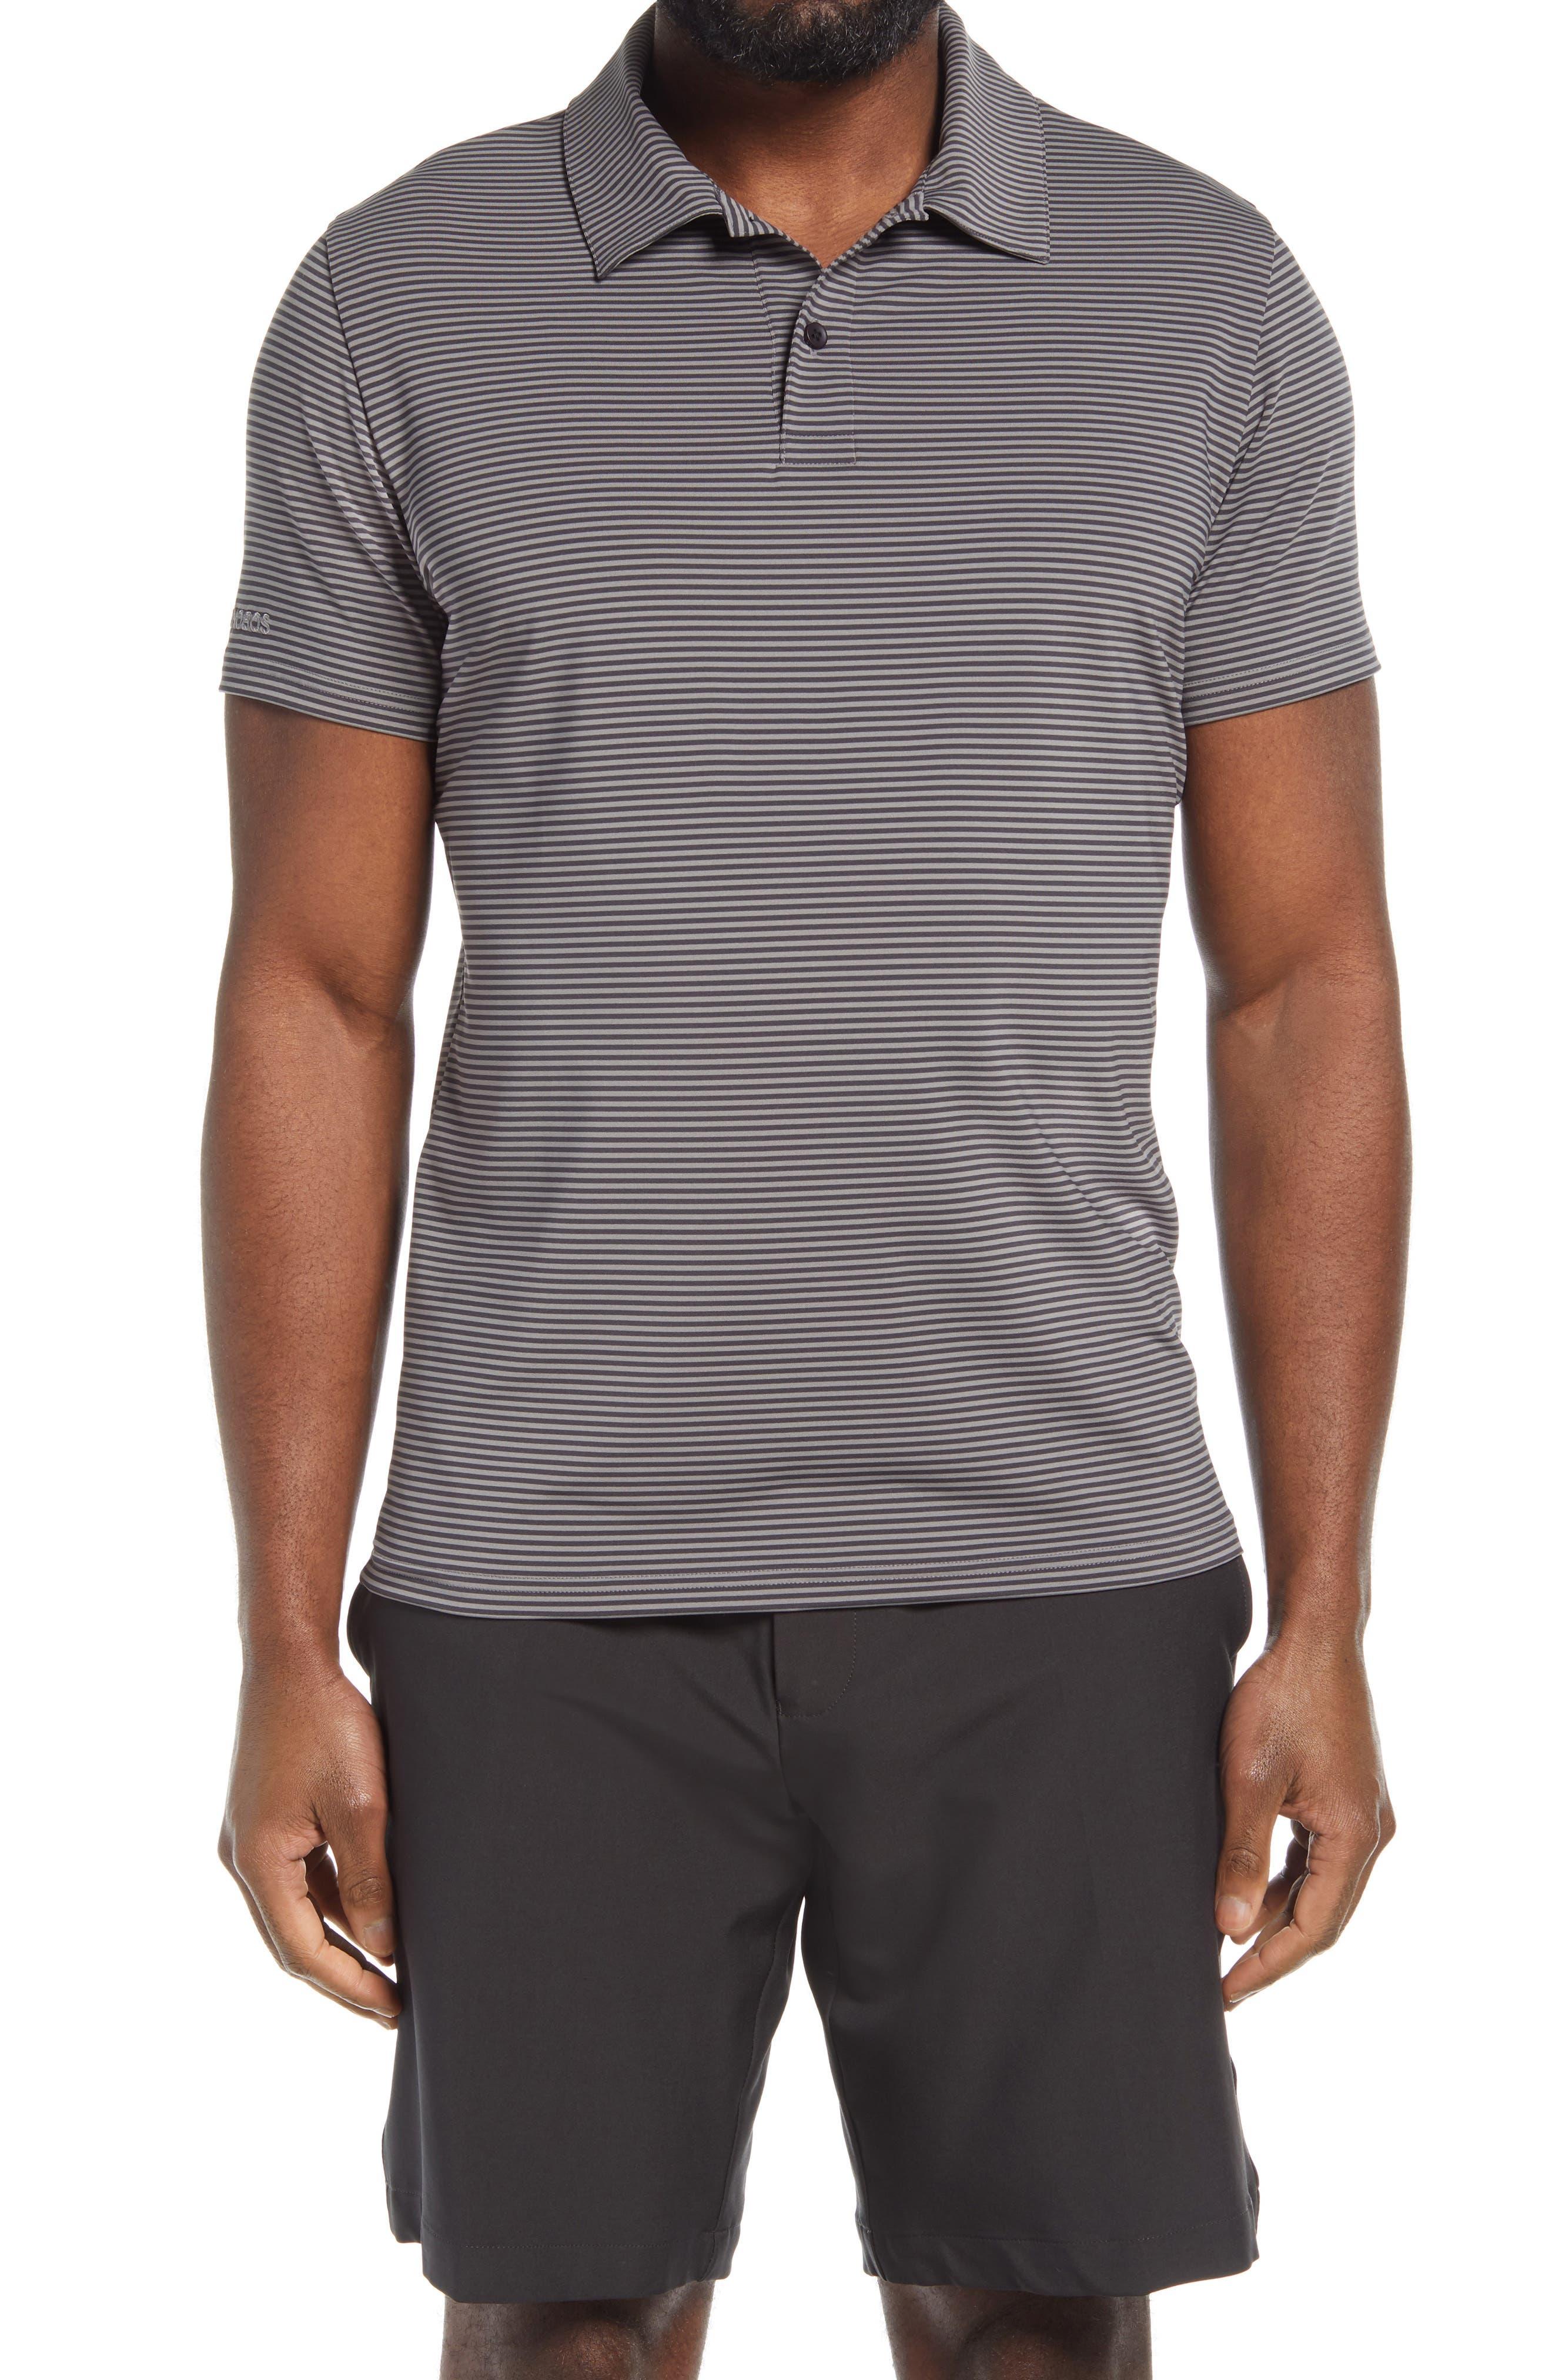 Men's Slim Fit Stripe Performance Golf Polo